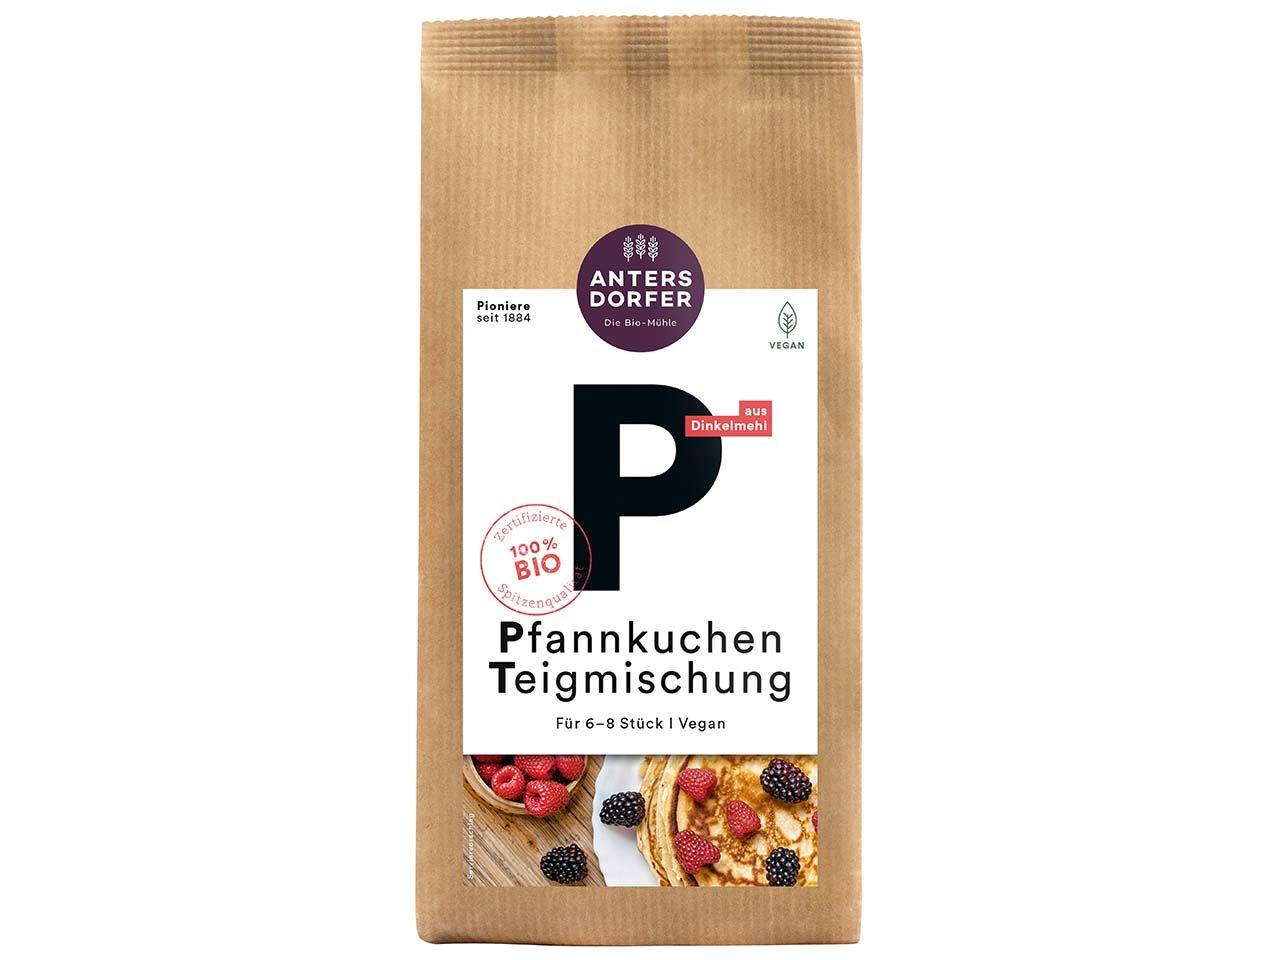 Antersdorfer Pfannkuchen Teigmischung 300 g A0416